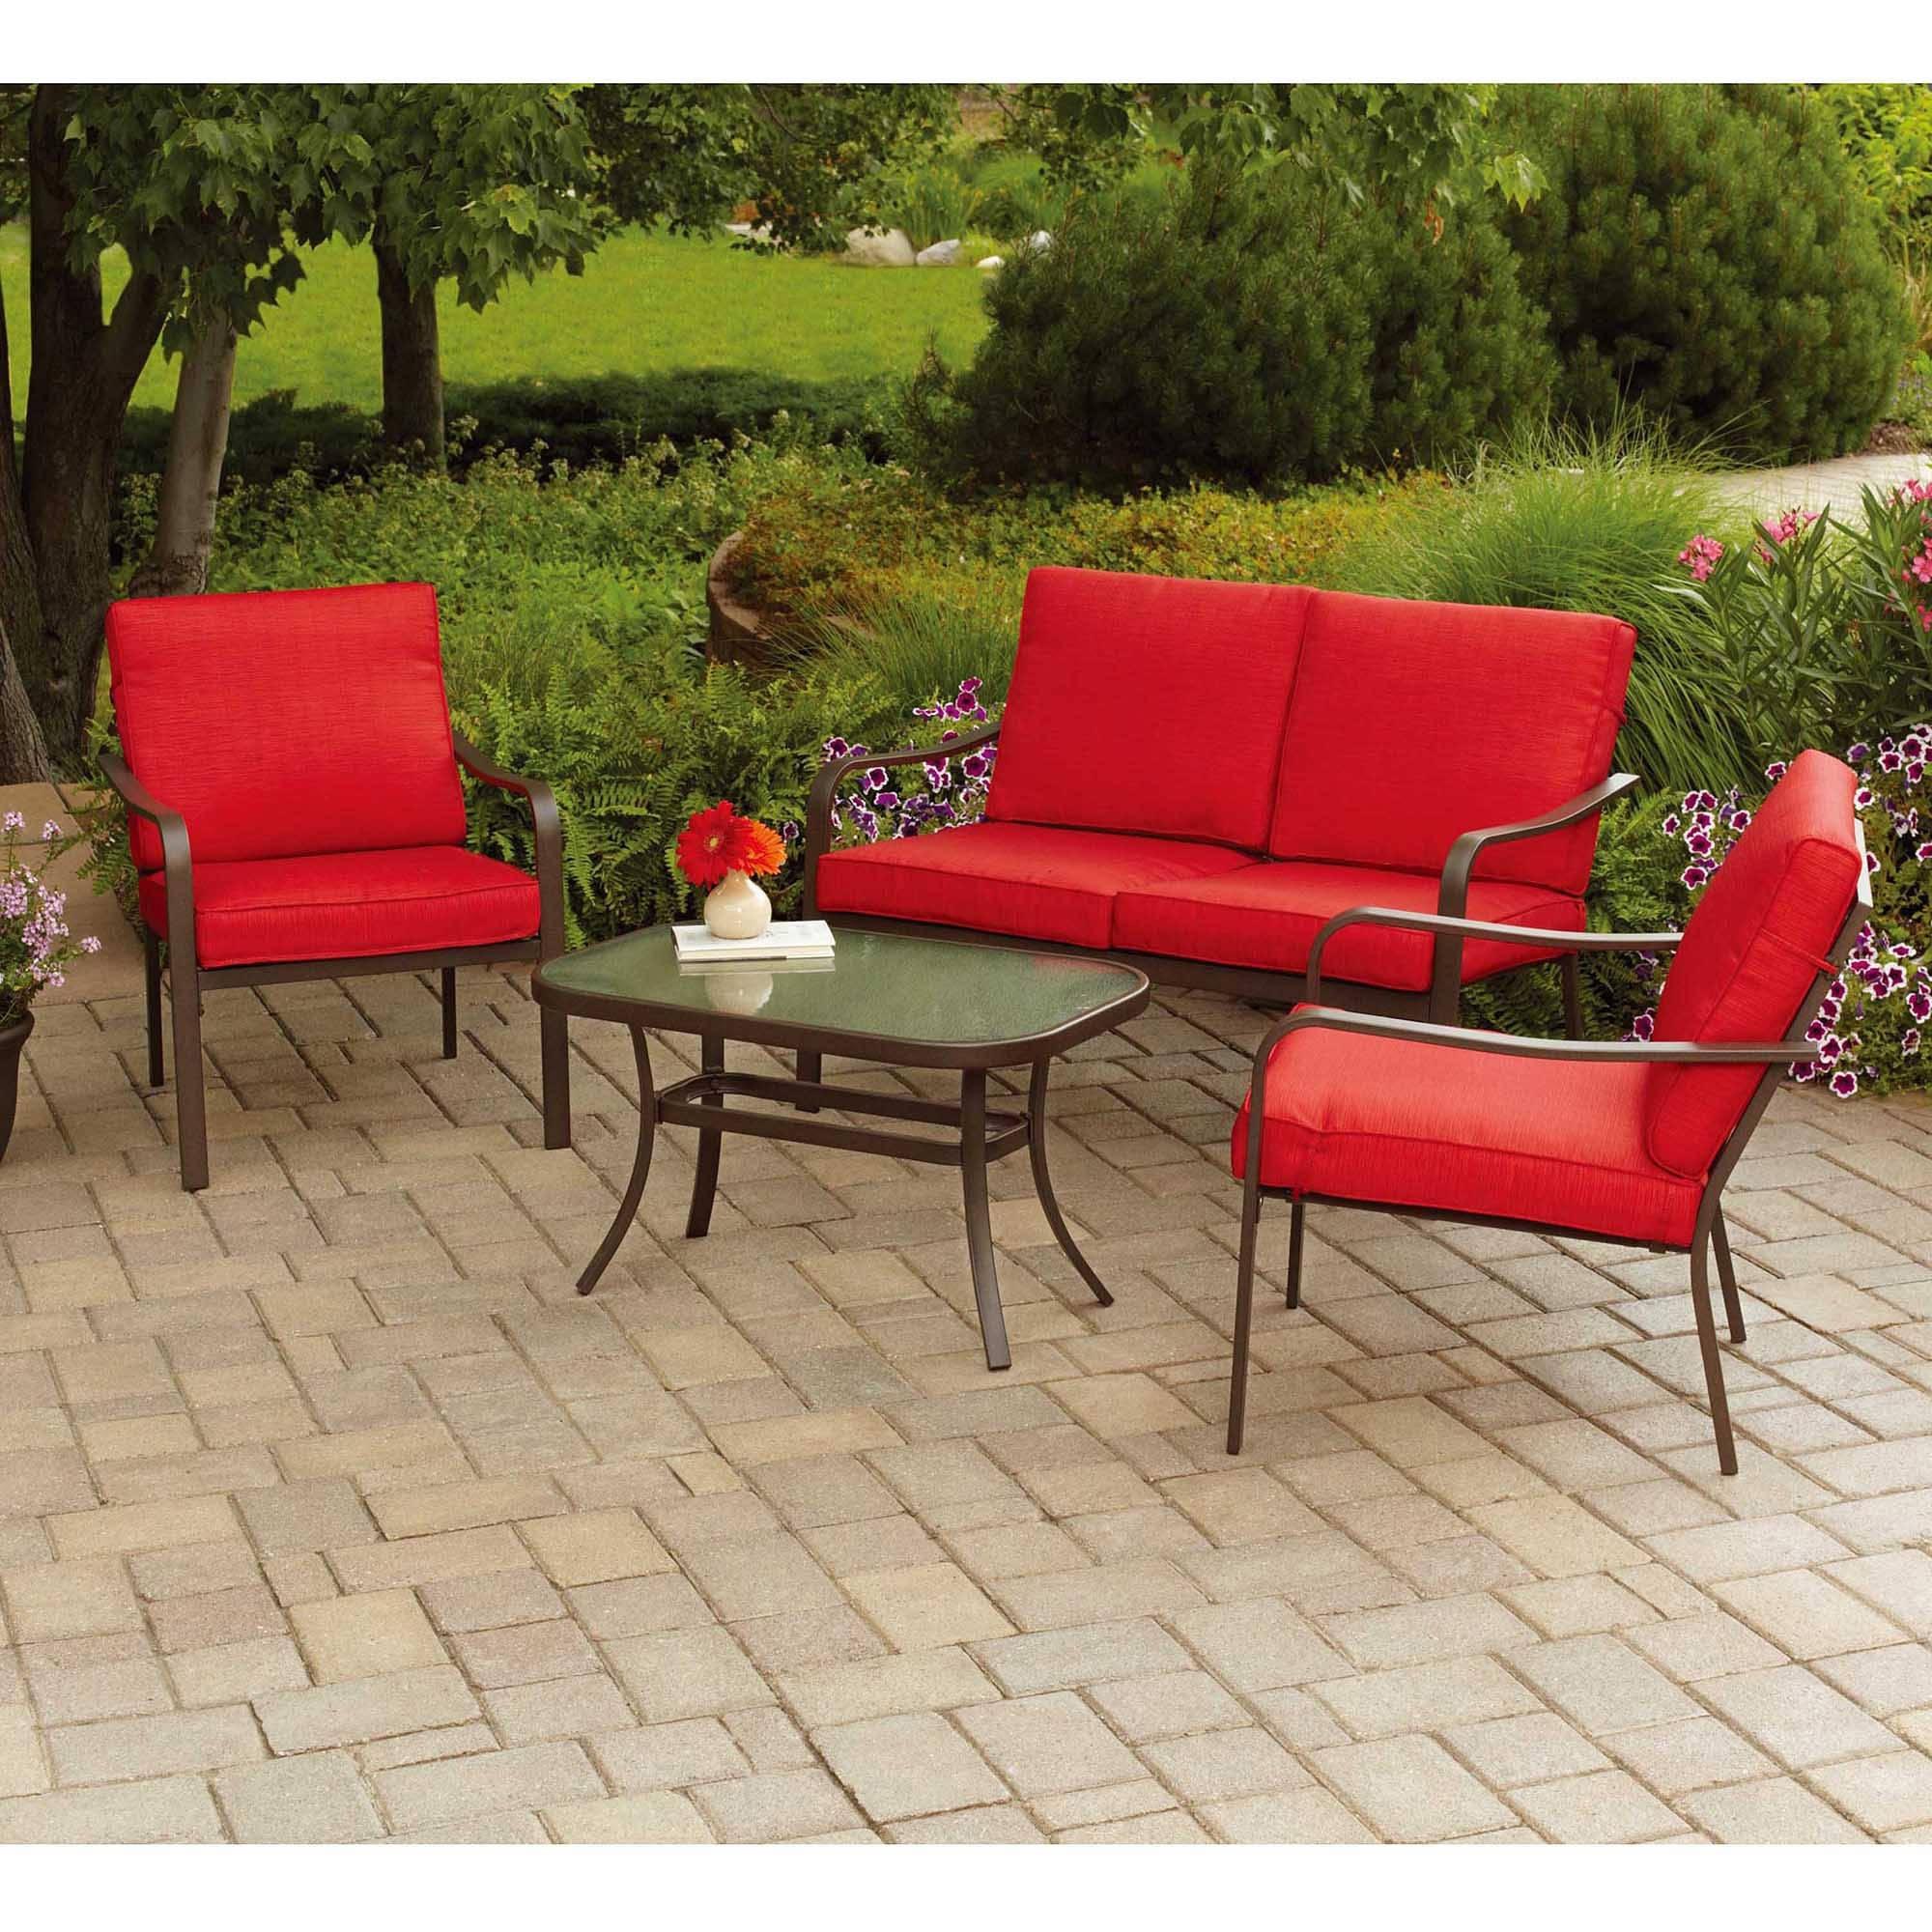 Preferred Mainstays Stanton Cushioned 4 Piece Patio Conversation Set, Seats 4 Regarding Patio Conversation Sets With Cushions (View 8 of 15)